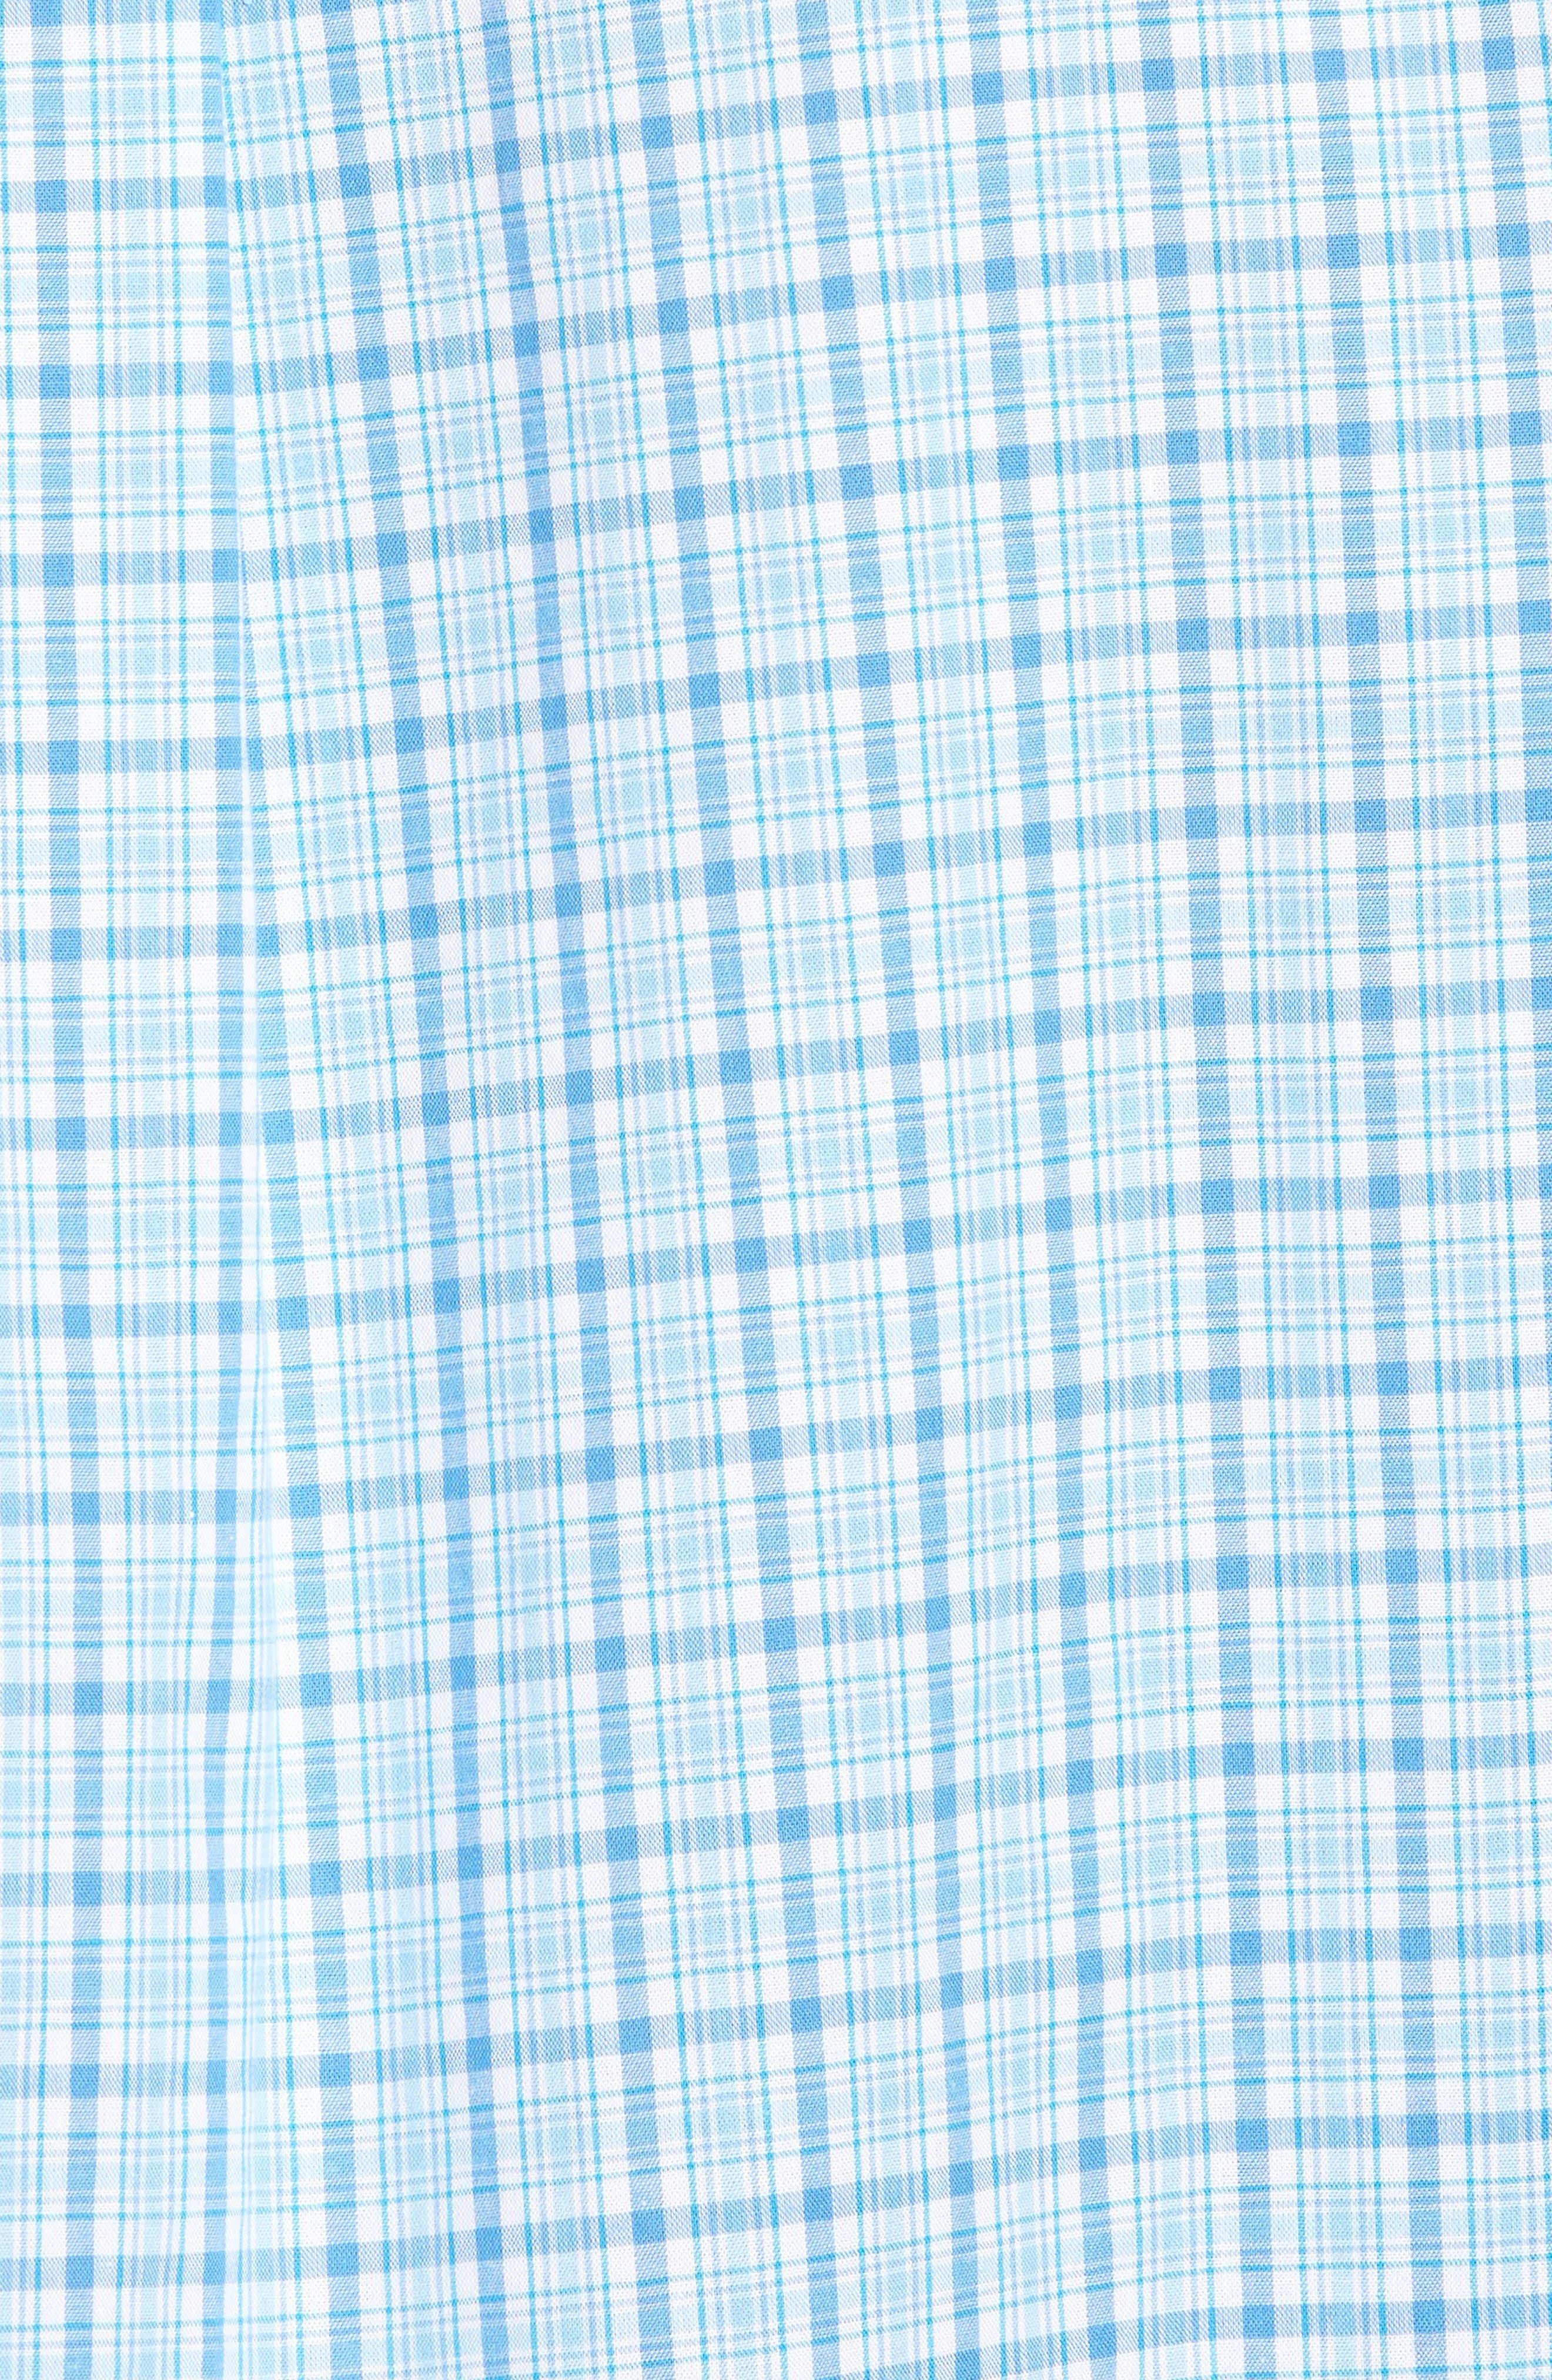 Seawatch Slim Fit Plaid Sport Shirt,                             Alternate thumbnail 5, color,                             459